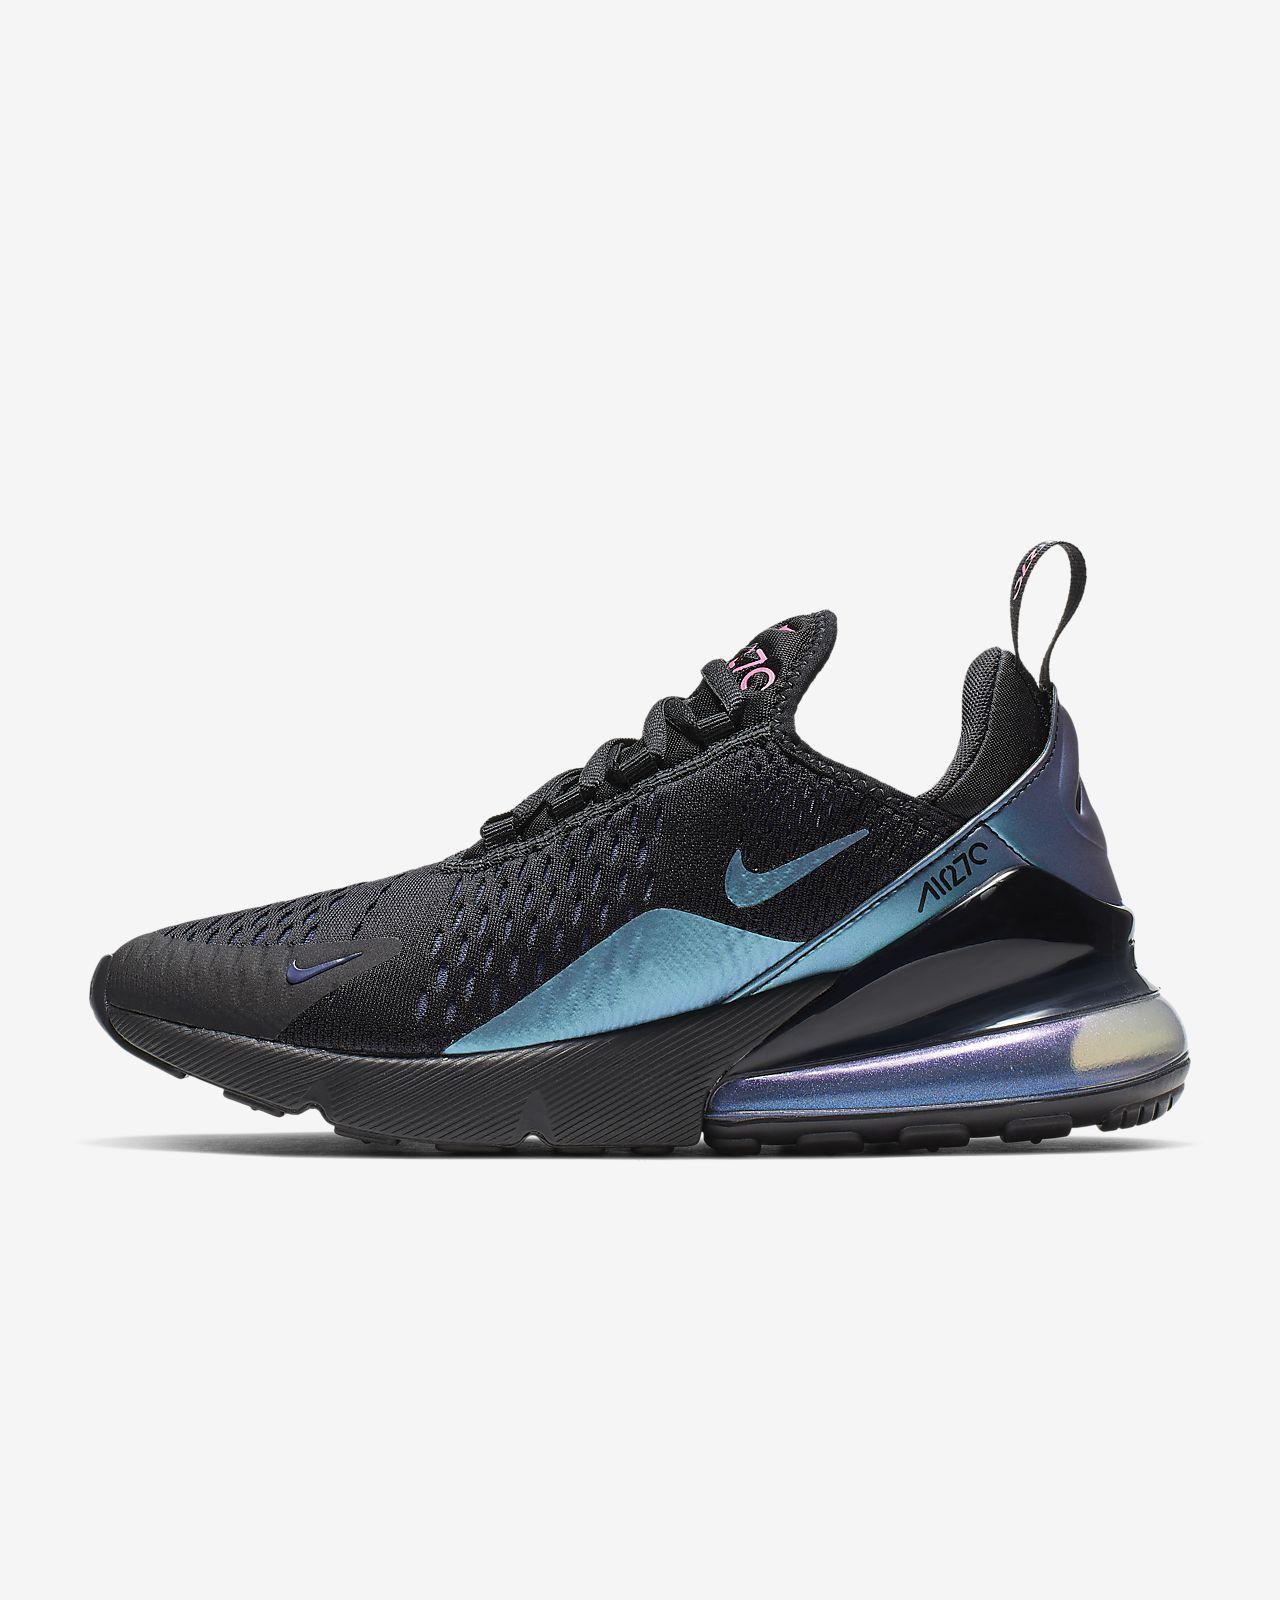 big sale 68cc8 08450 ... Nike Air Max 270-sko til kvinder